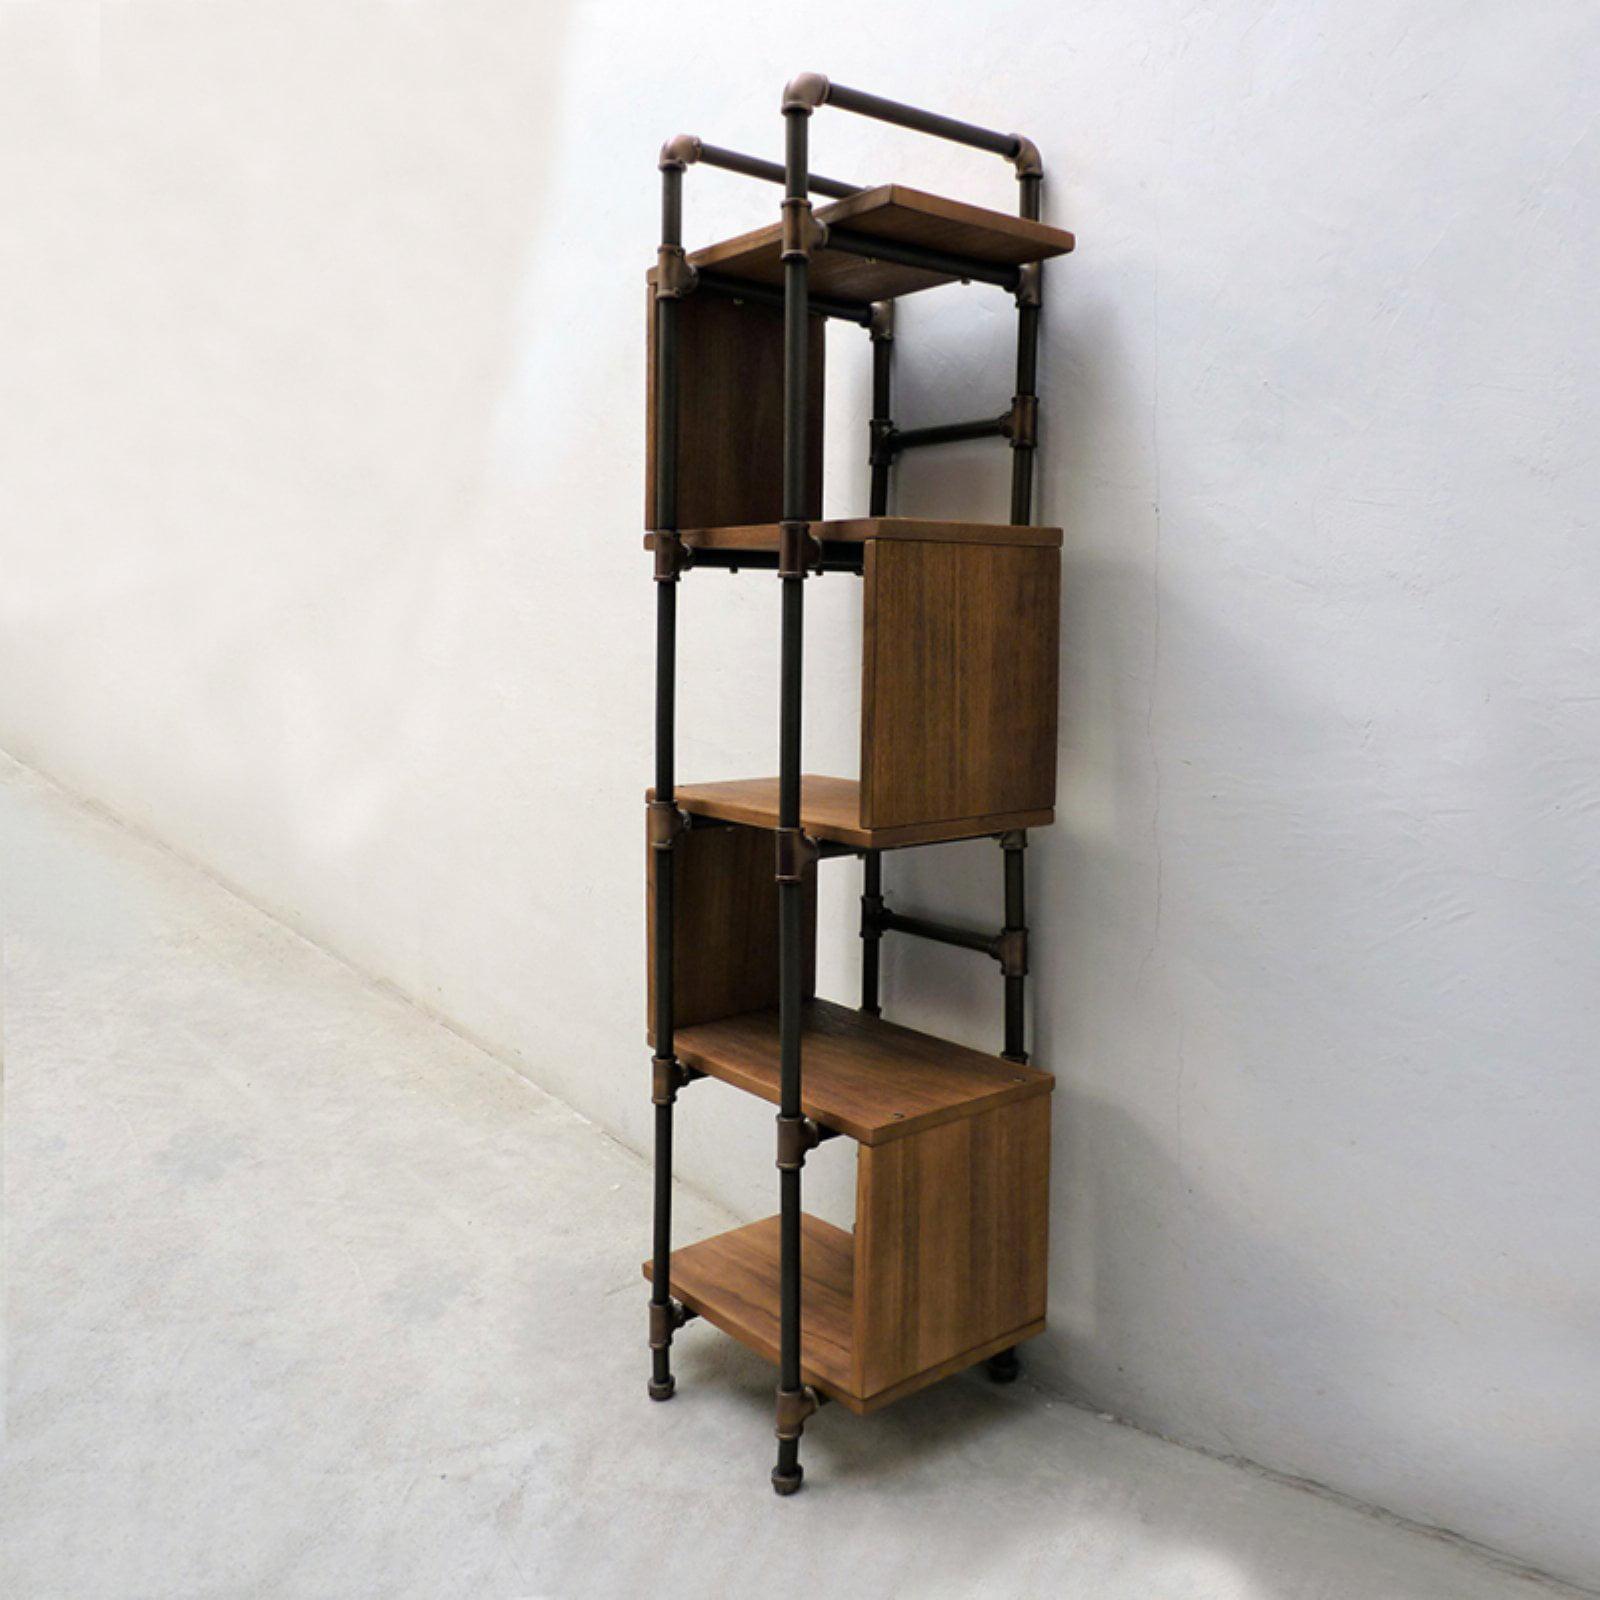 Furniture pipeline tucson modern industrial etagere bookcase